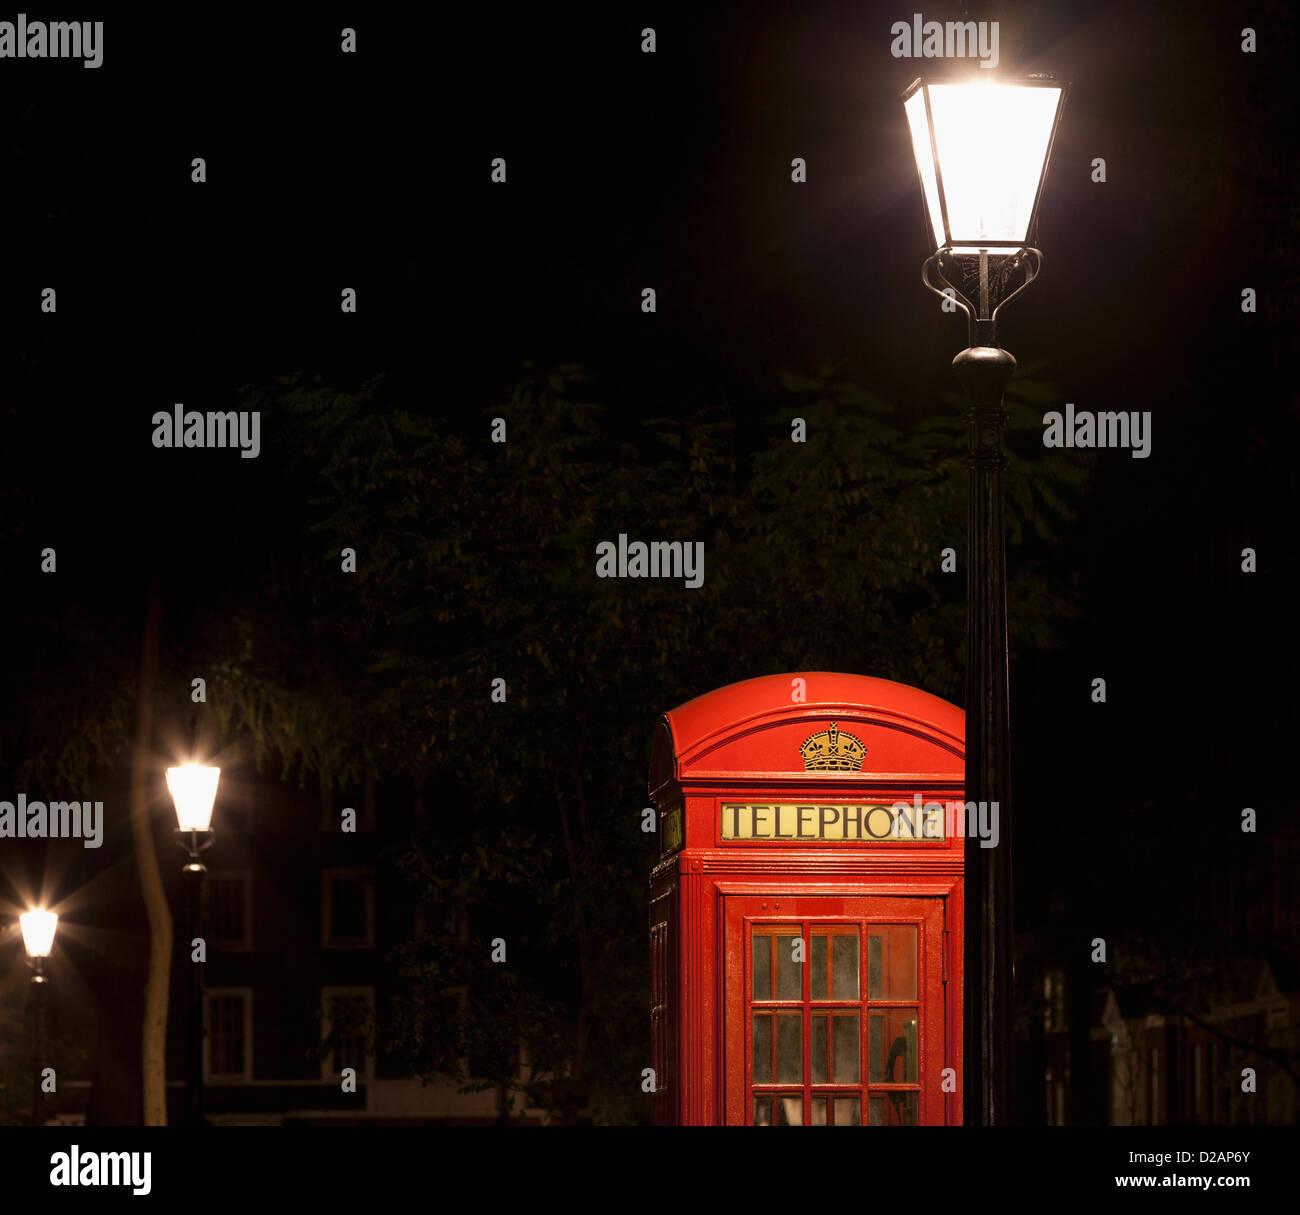 Red telephone box on city street - Stock Image